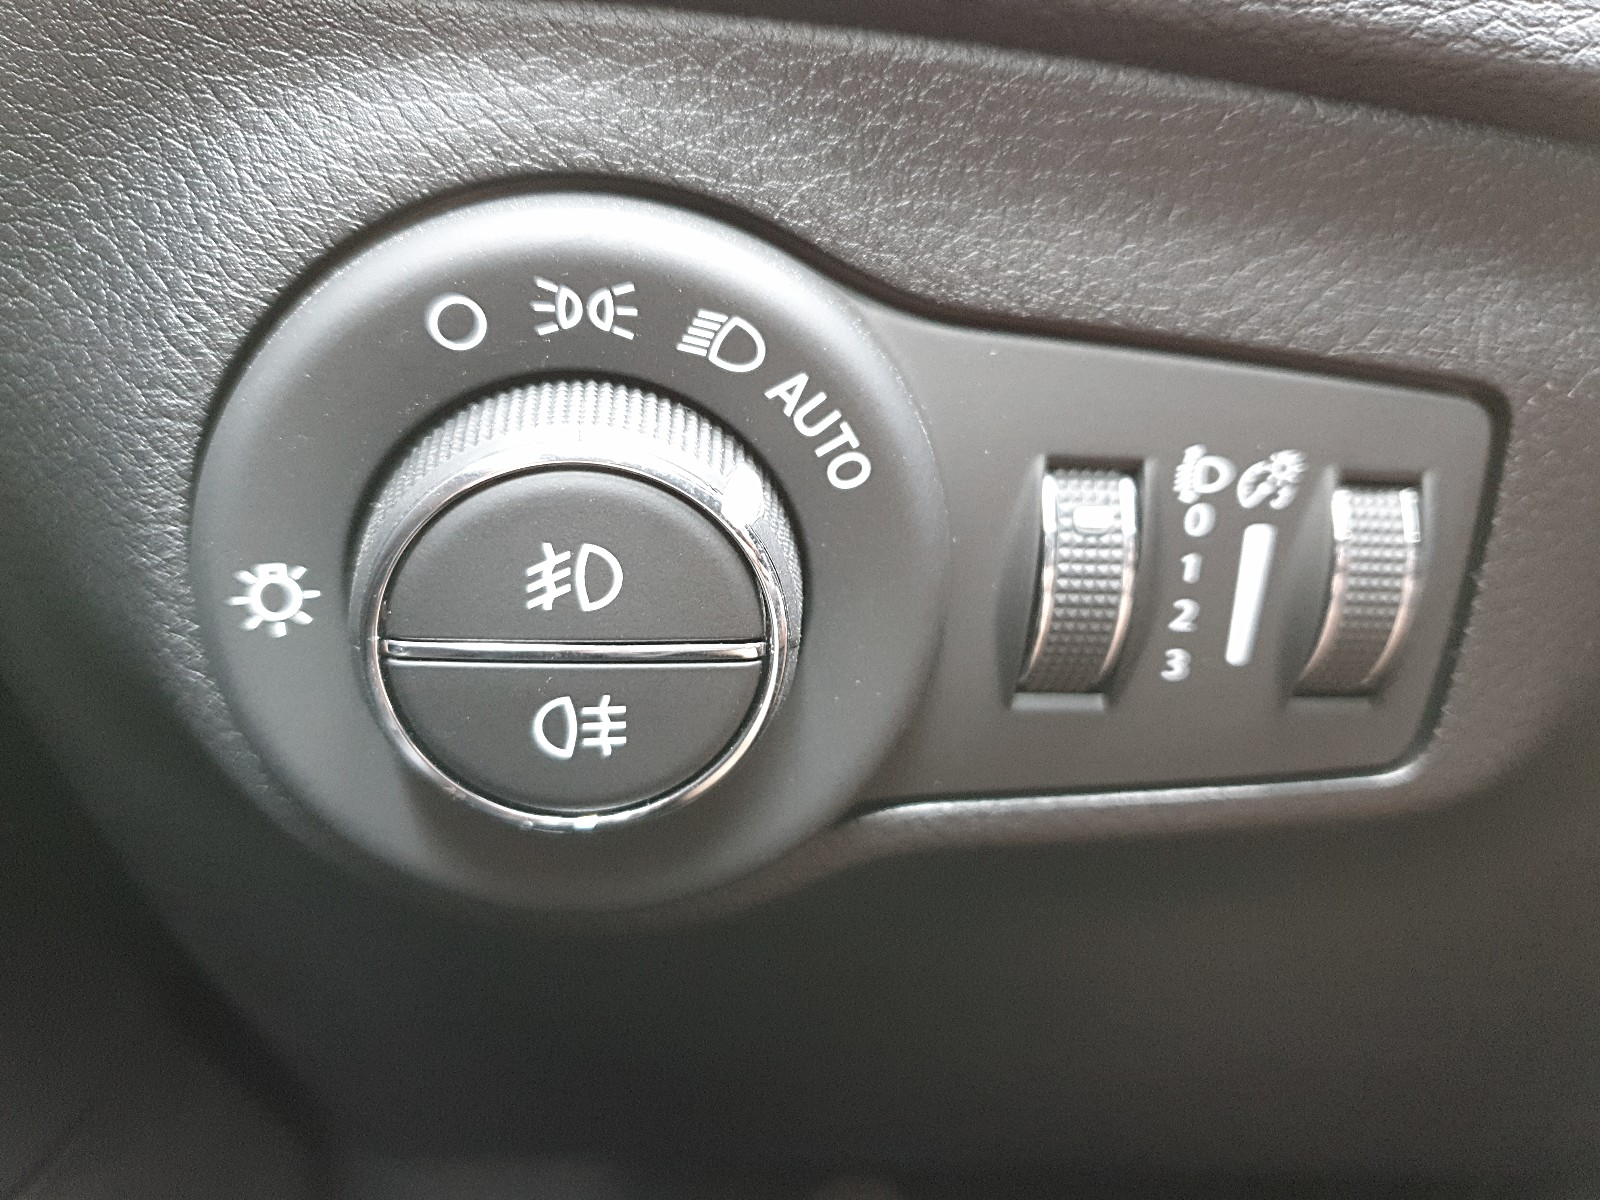 JEEP COMPASS 1.4 170PS 4x4 Automatik Limited Voll-Leder Klimaautomatik Rückf. Viscaal Fahrzeuggrosshandel GmbH, D-49847 Itterbeck